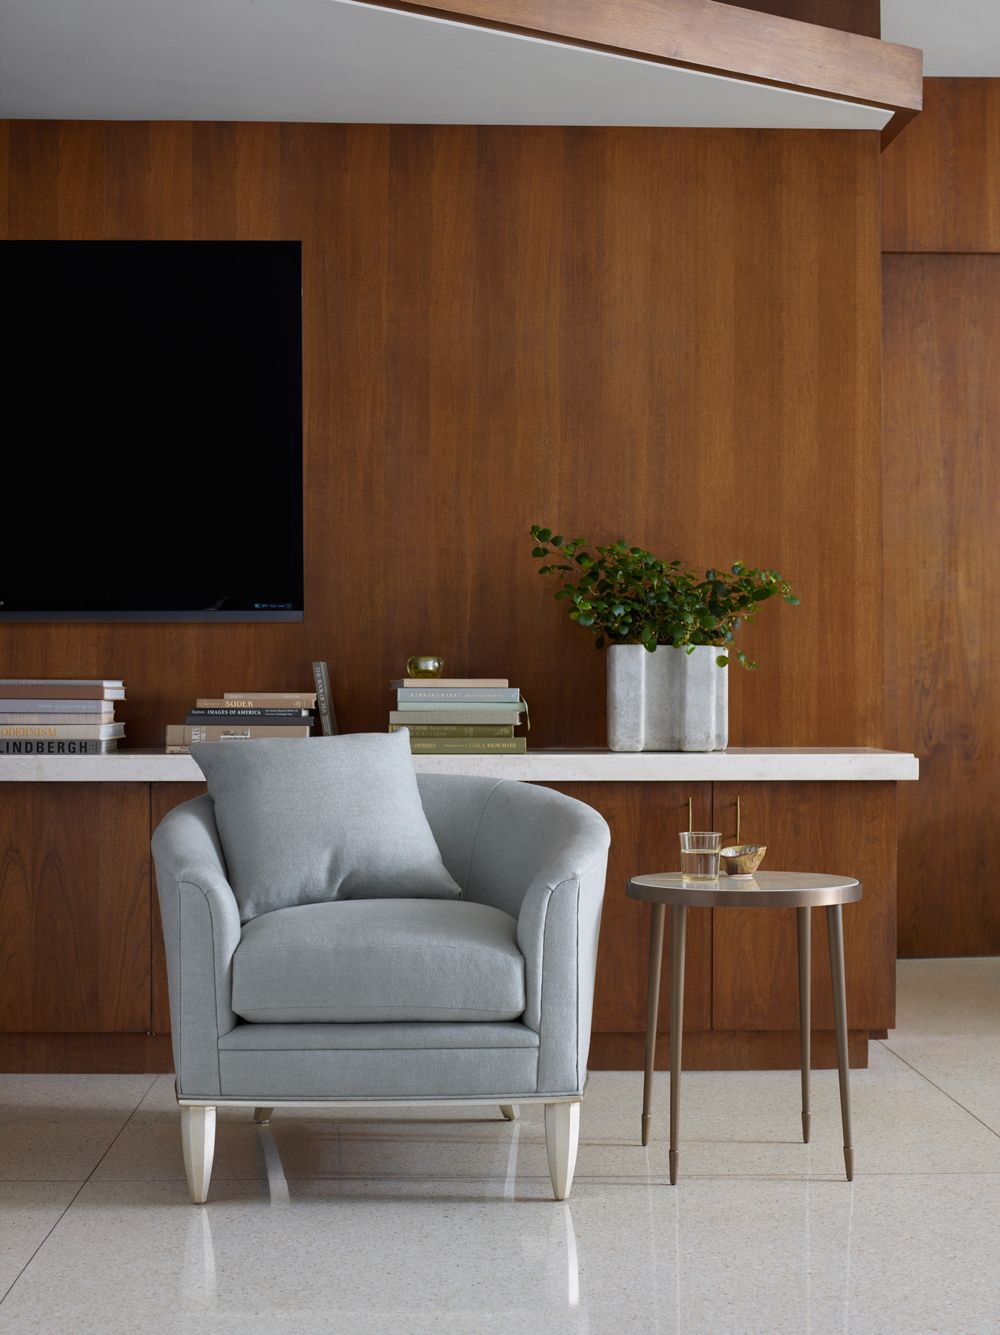 Sausalito Chair | The Barbara Barry Collection | Baker Furniture ATELIER  DIA / TJANTEK NYA ASYURA HATTA COLLECTIONS